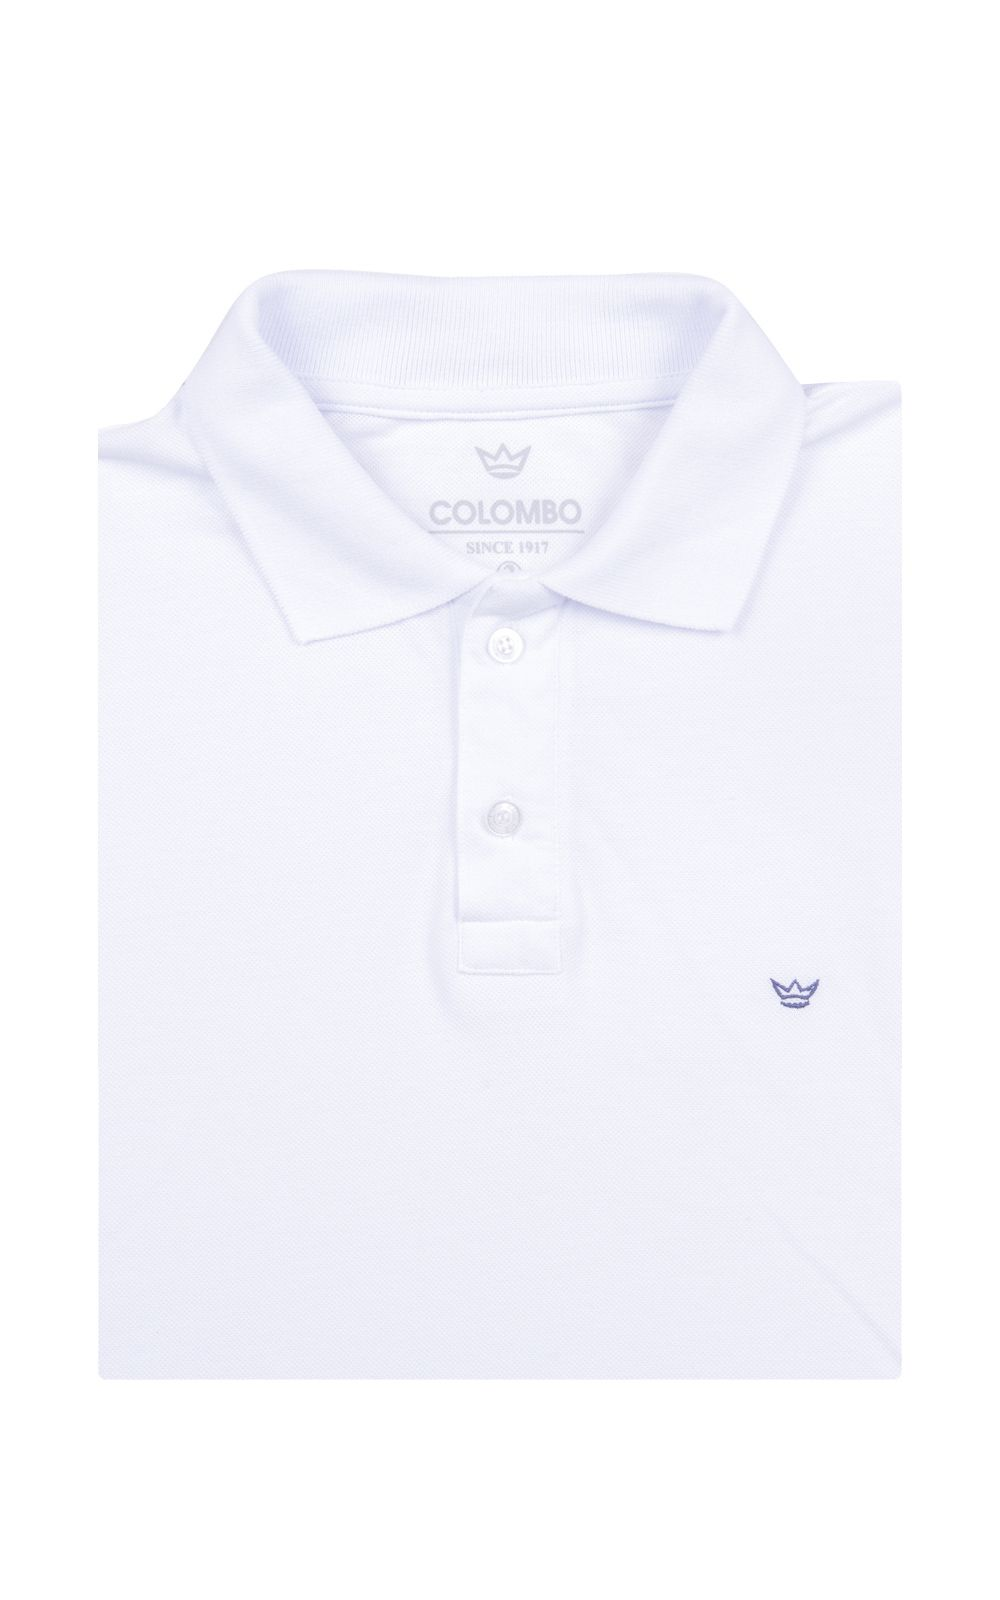 Foto 4 - Camisa Polo Masculina Branca Lisa